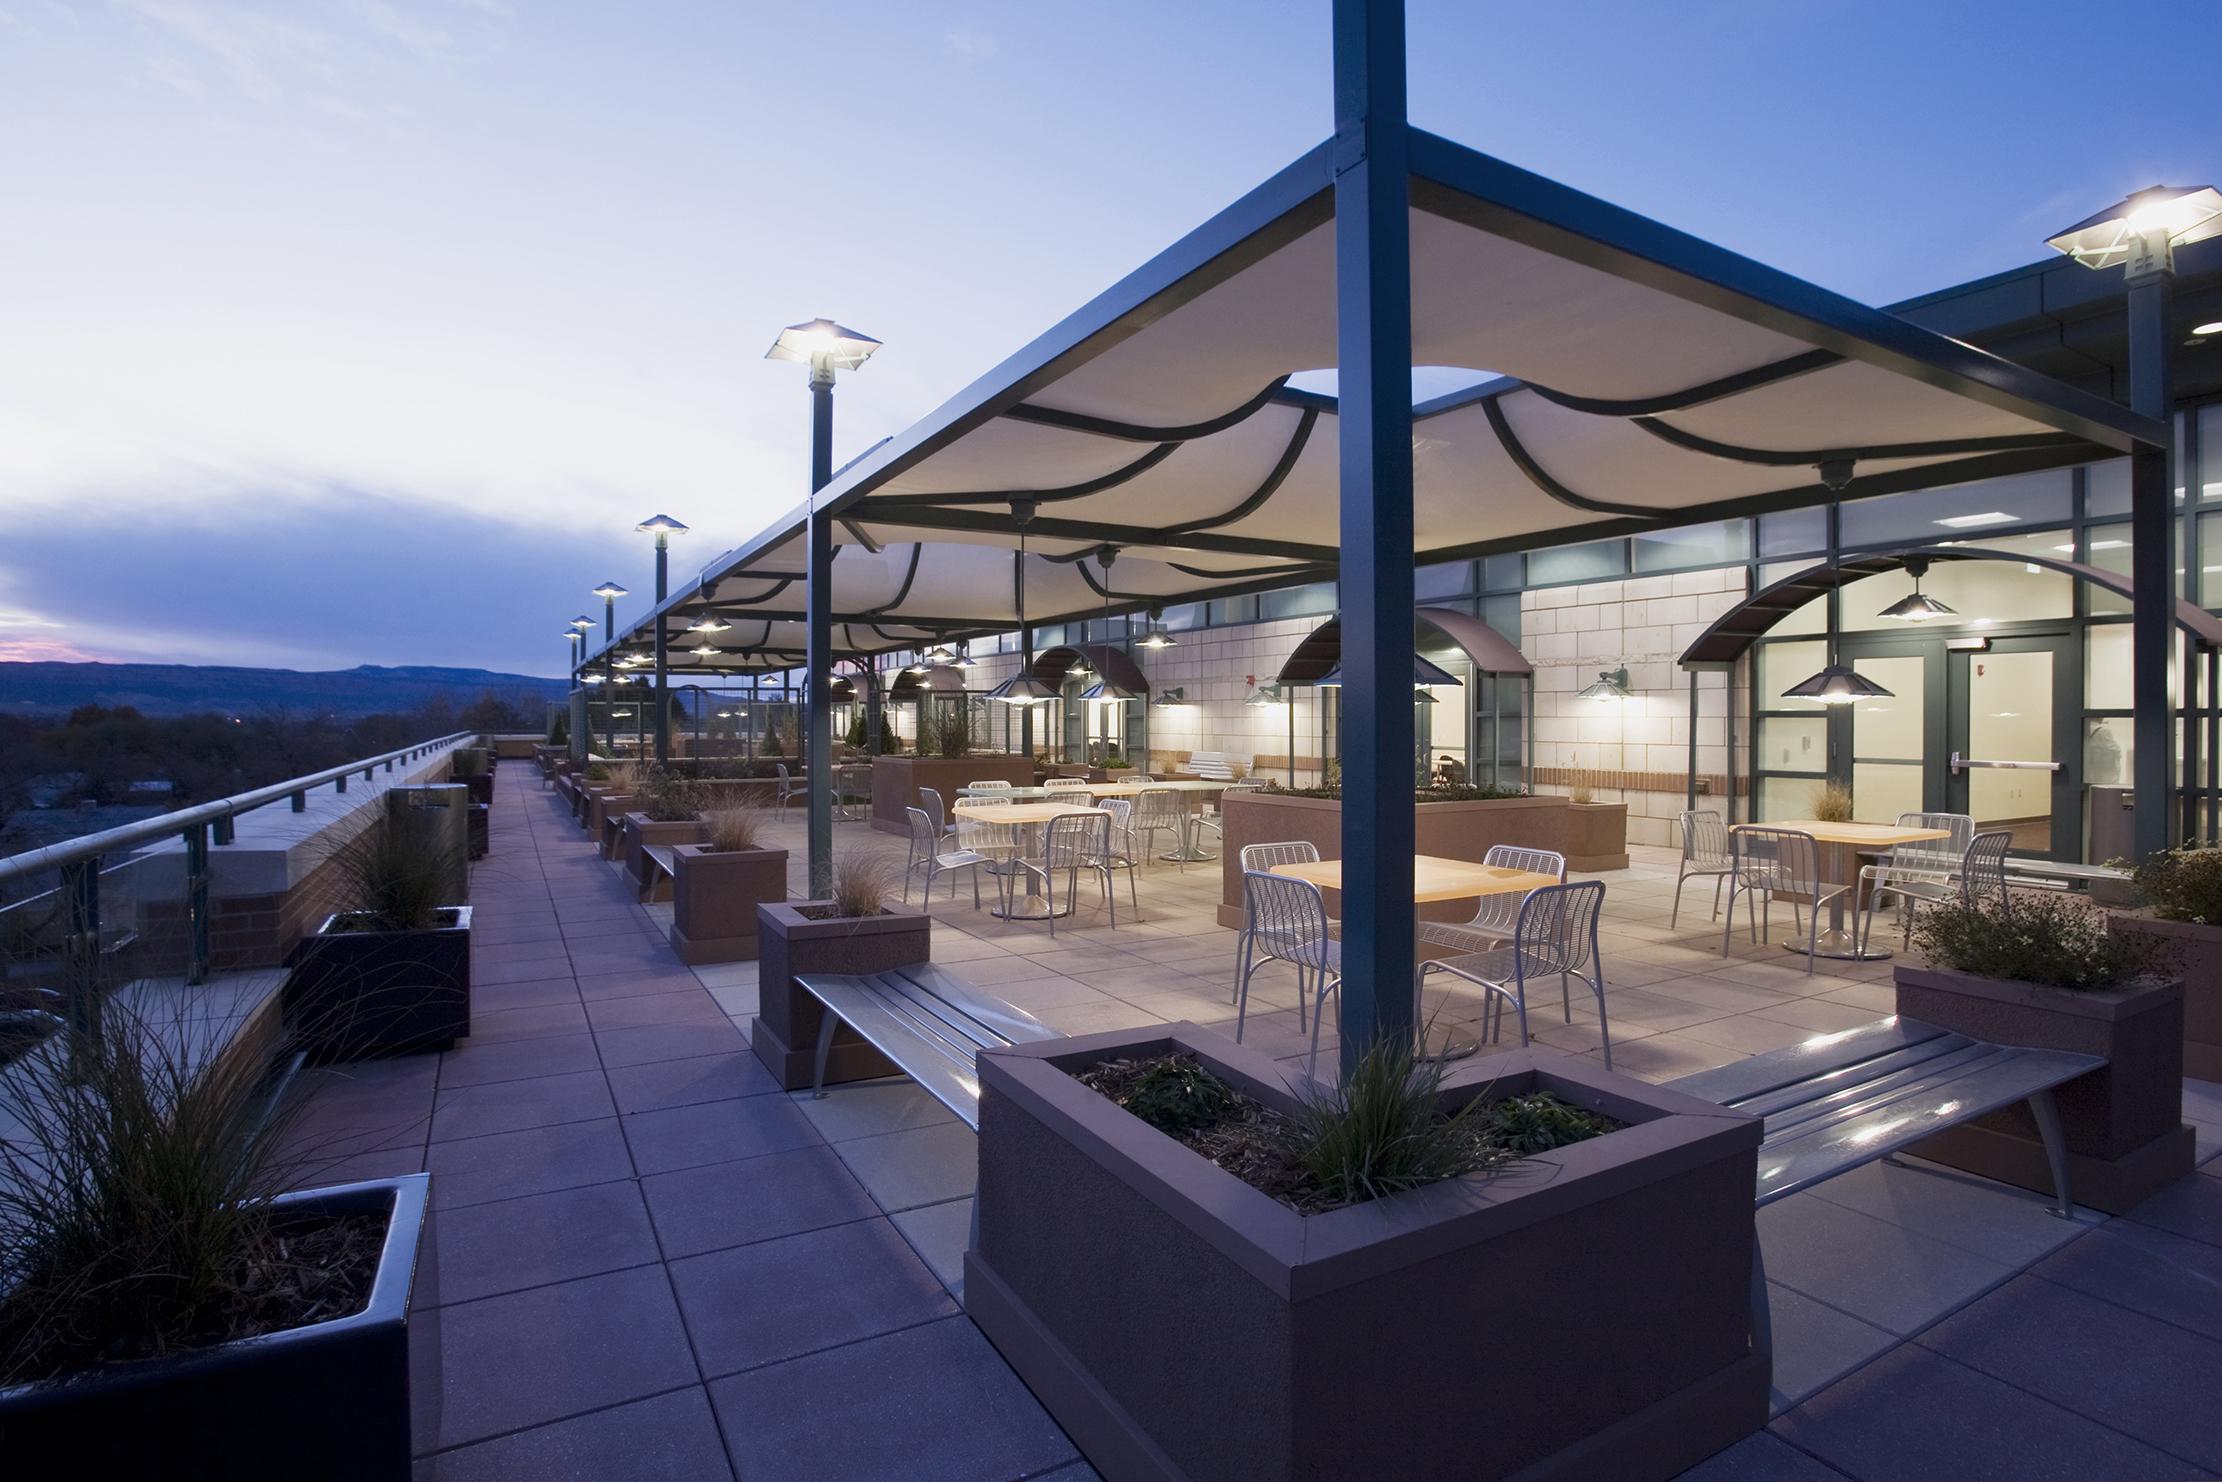 Dominguez Hall Outdoor Seating - Colorado Mesa University - Grand Junction, CO